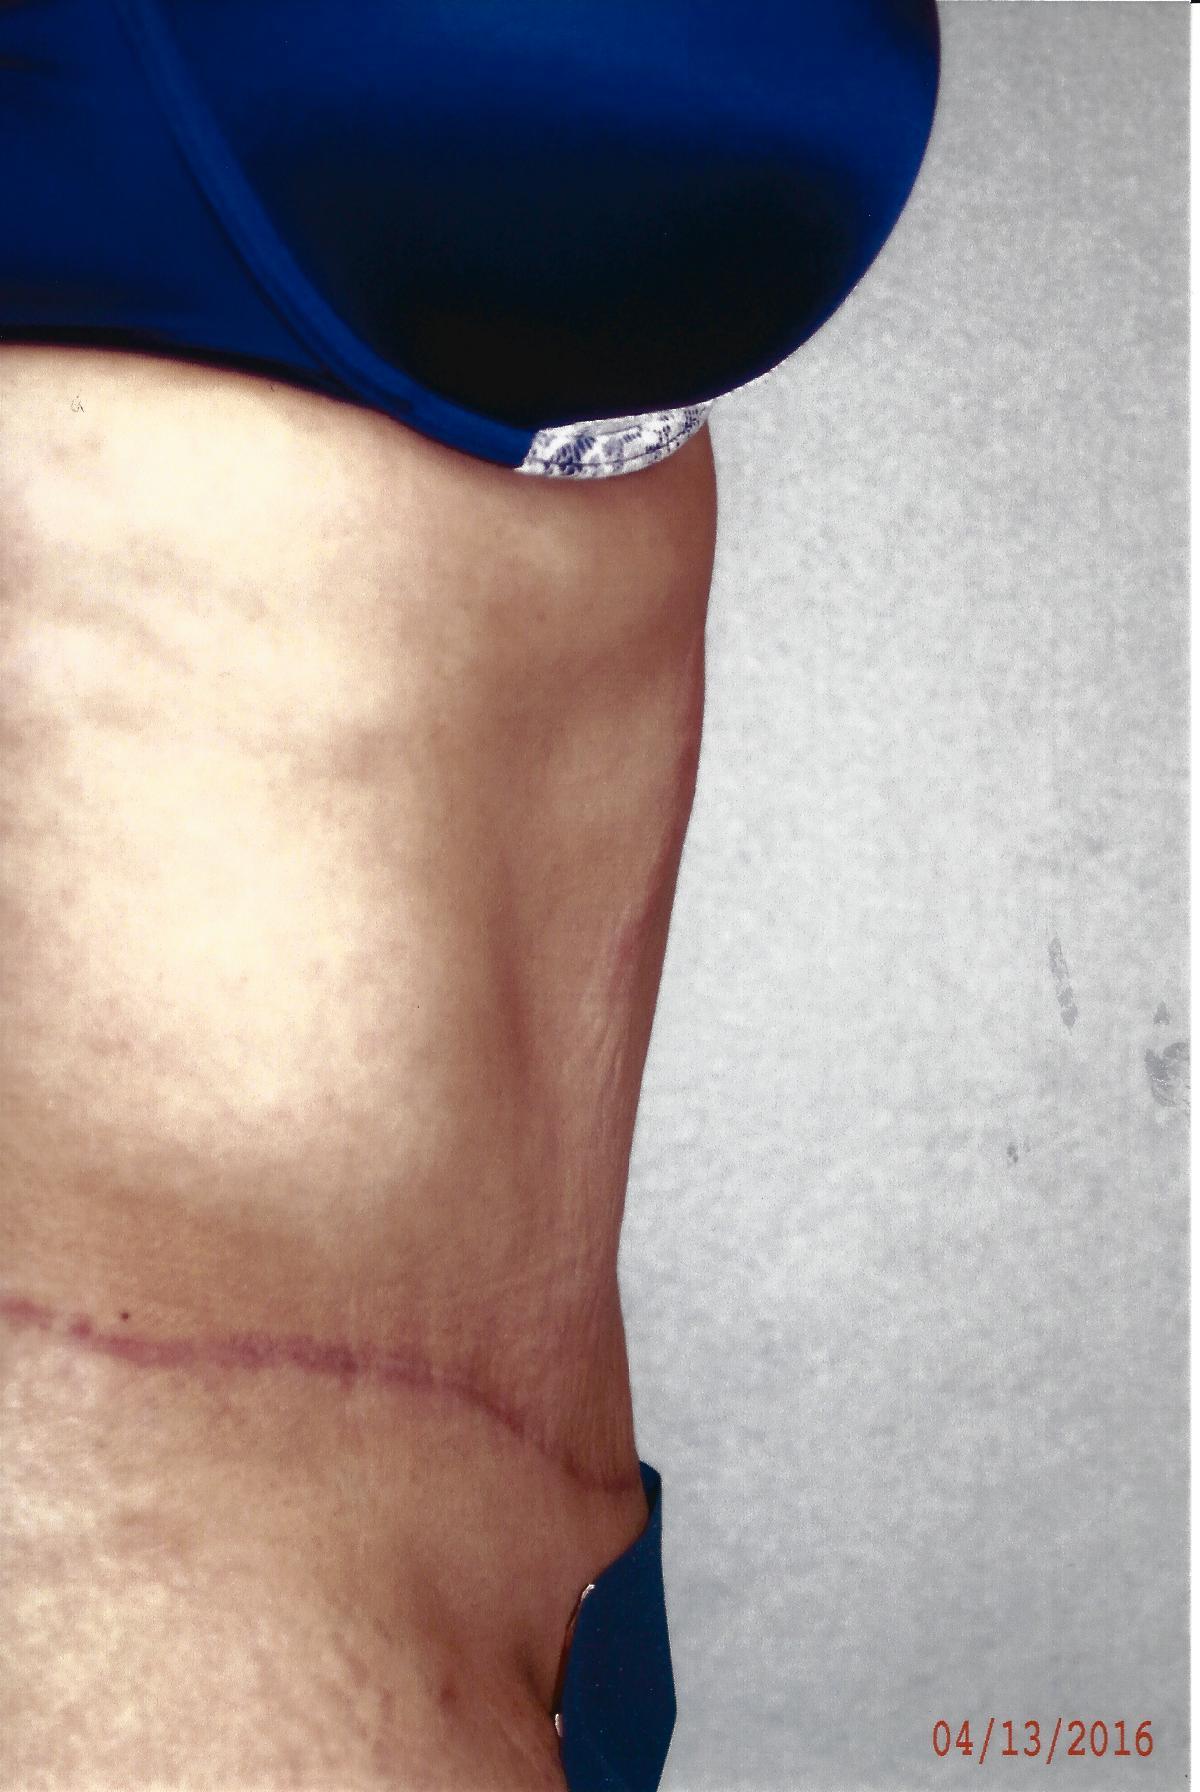 Abdominoplasty - Dr. Richard Bosshardt